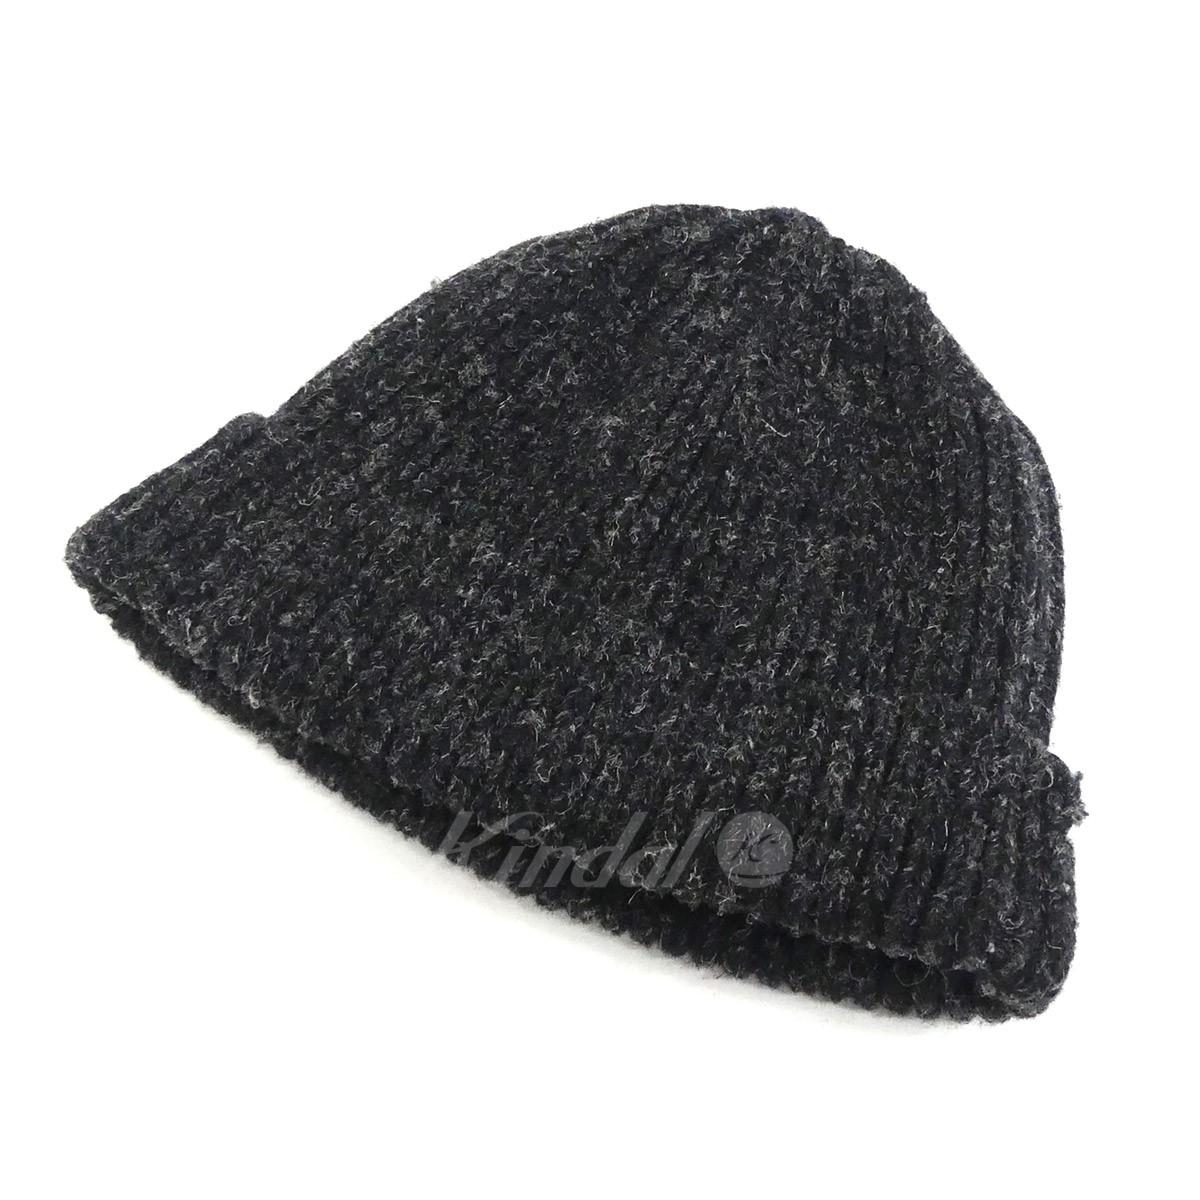 kindal  JAN JAN VAN ESSCHE knit cap BEANIE 5 gray size  M (ヤンヤンバンエシュ)  503438e08d5